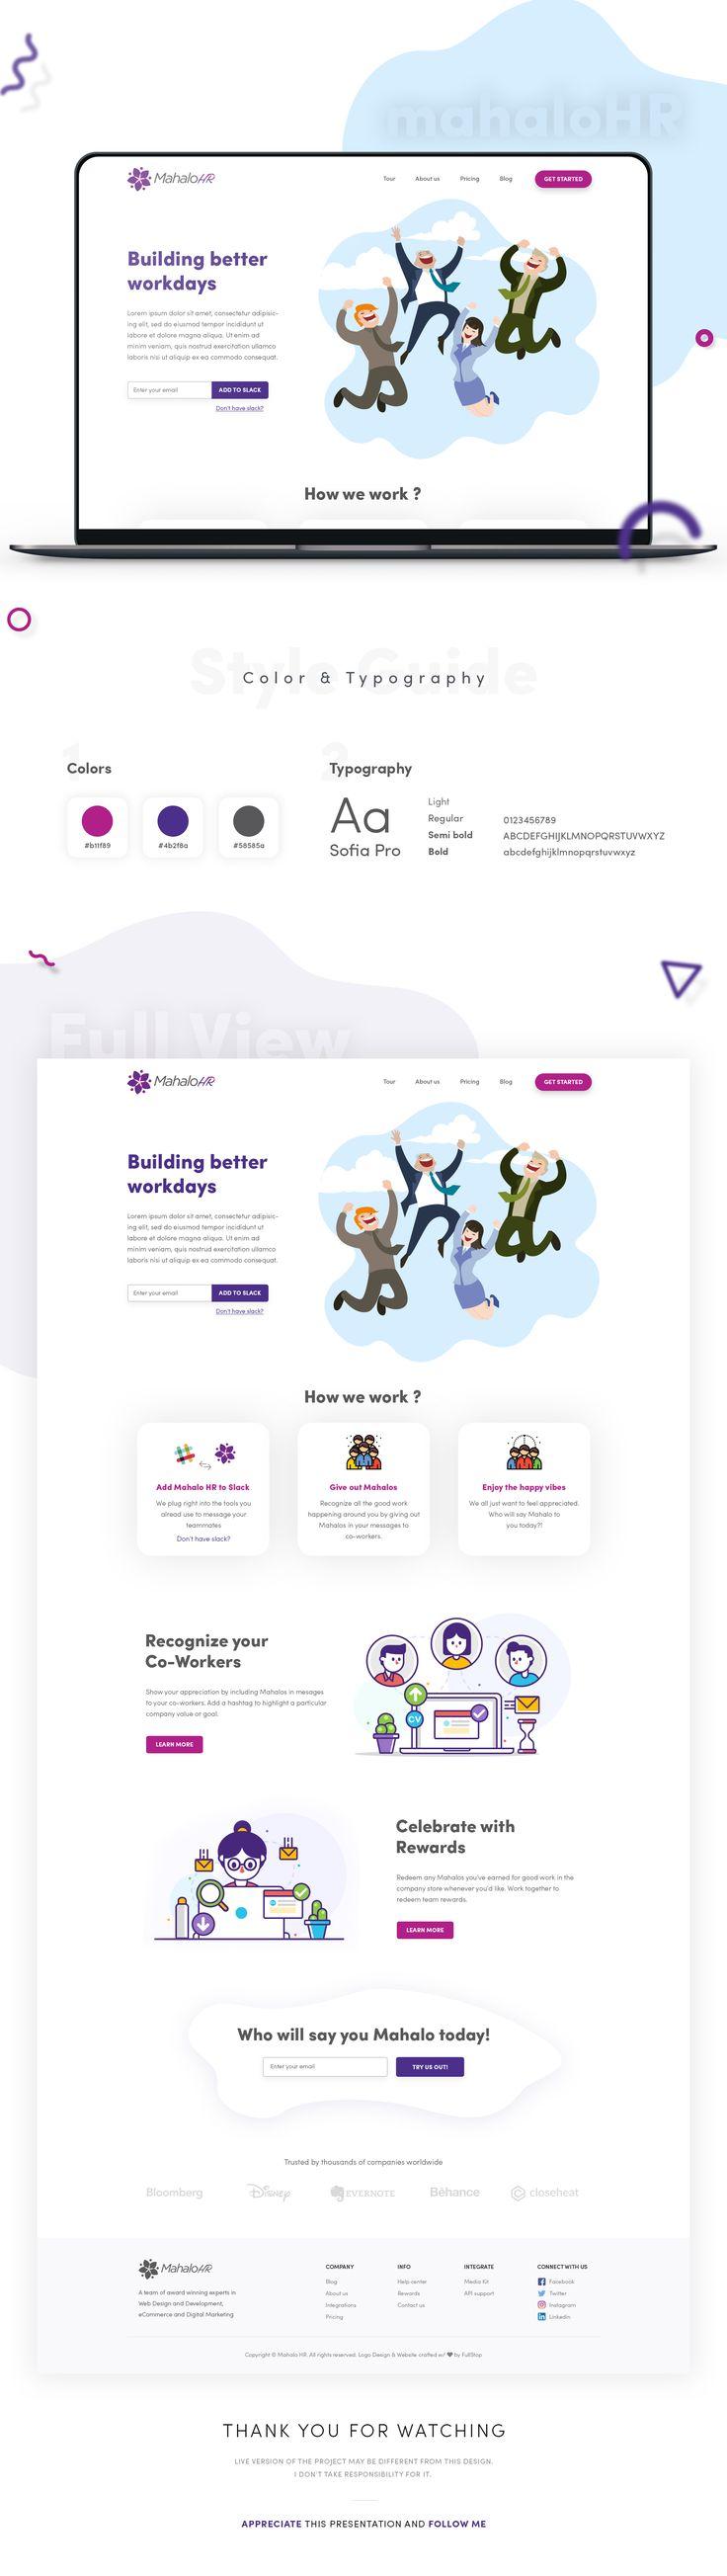 Consultez ce projet @Behance: « MahaloHR - website design » https://www.behance.net/gallery/62628159/MahaloHR-website-design